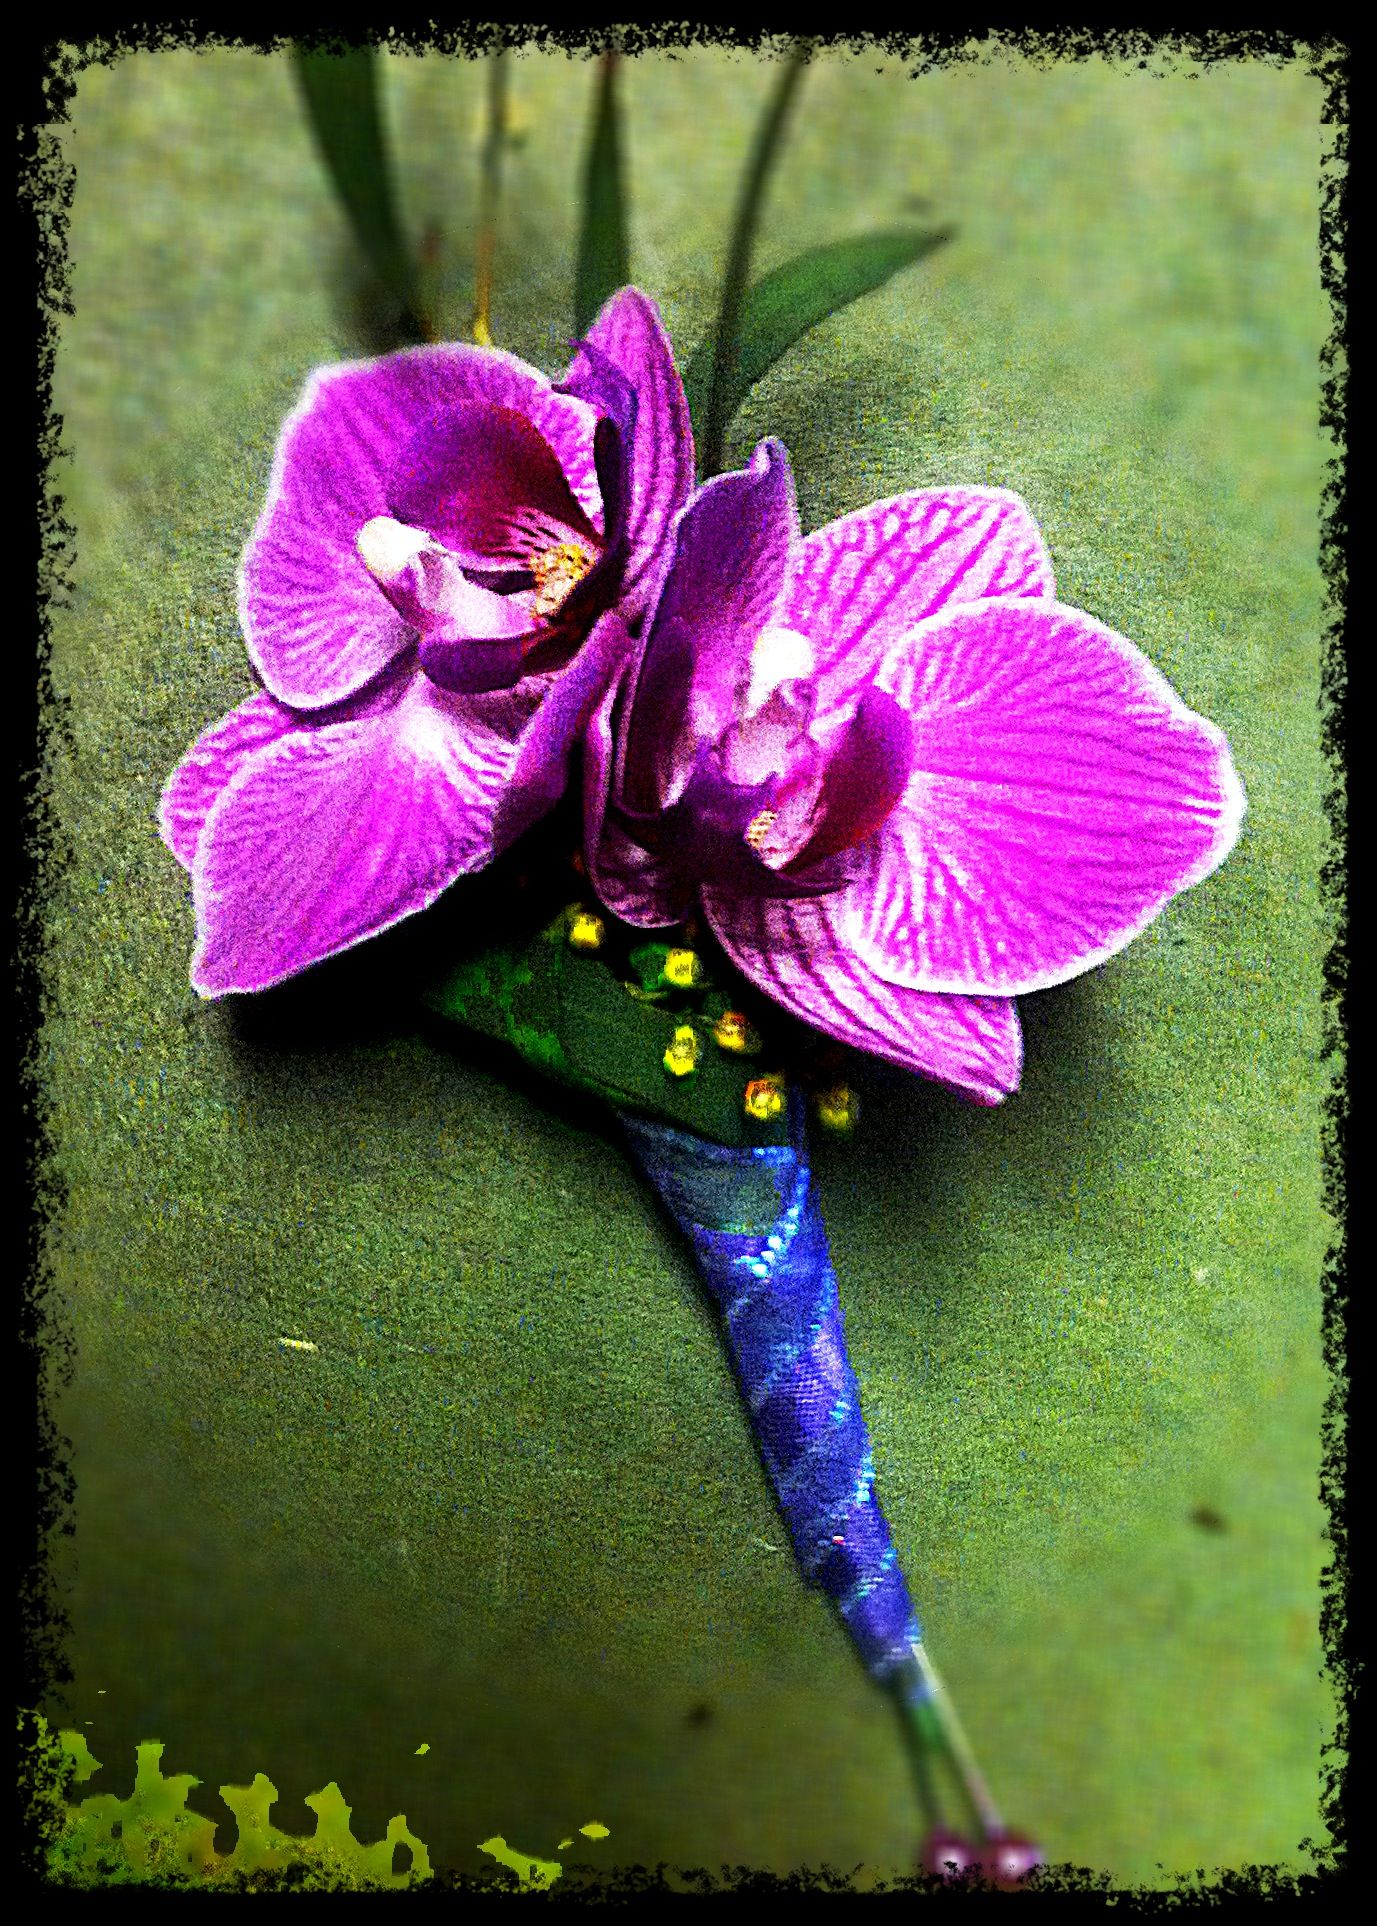 Purple Phalaenopsis Orchid Boutonniere Floral Design By Greens Beans Orchid Boutonniere Phalaenopsis Orchid Boutonniere